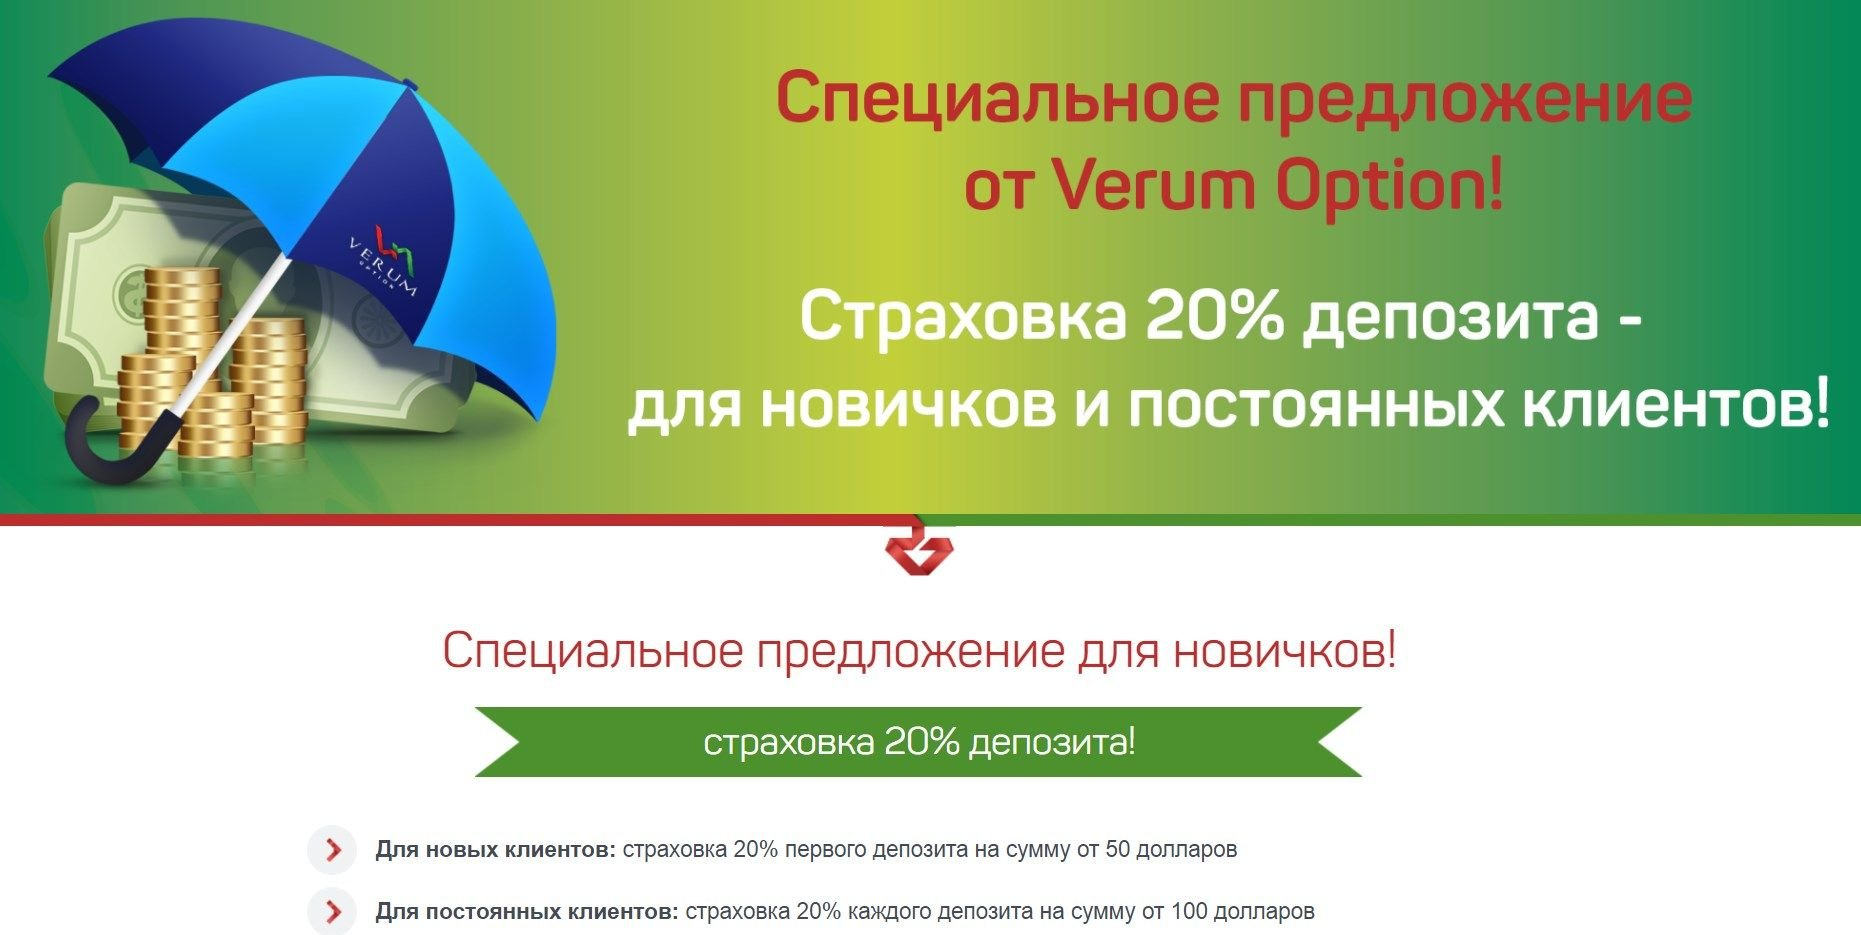 Акция «Cтраховка 20% первого депозита» у Verum Option